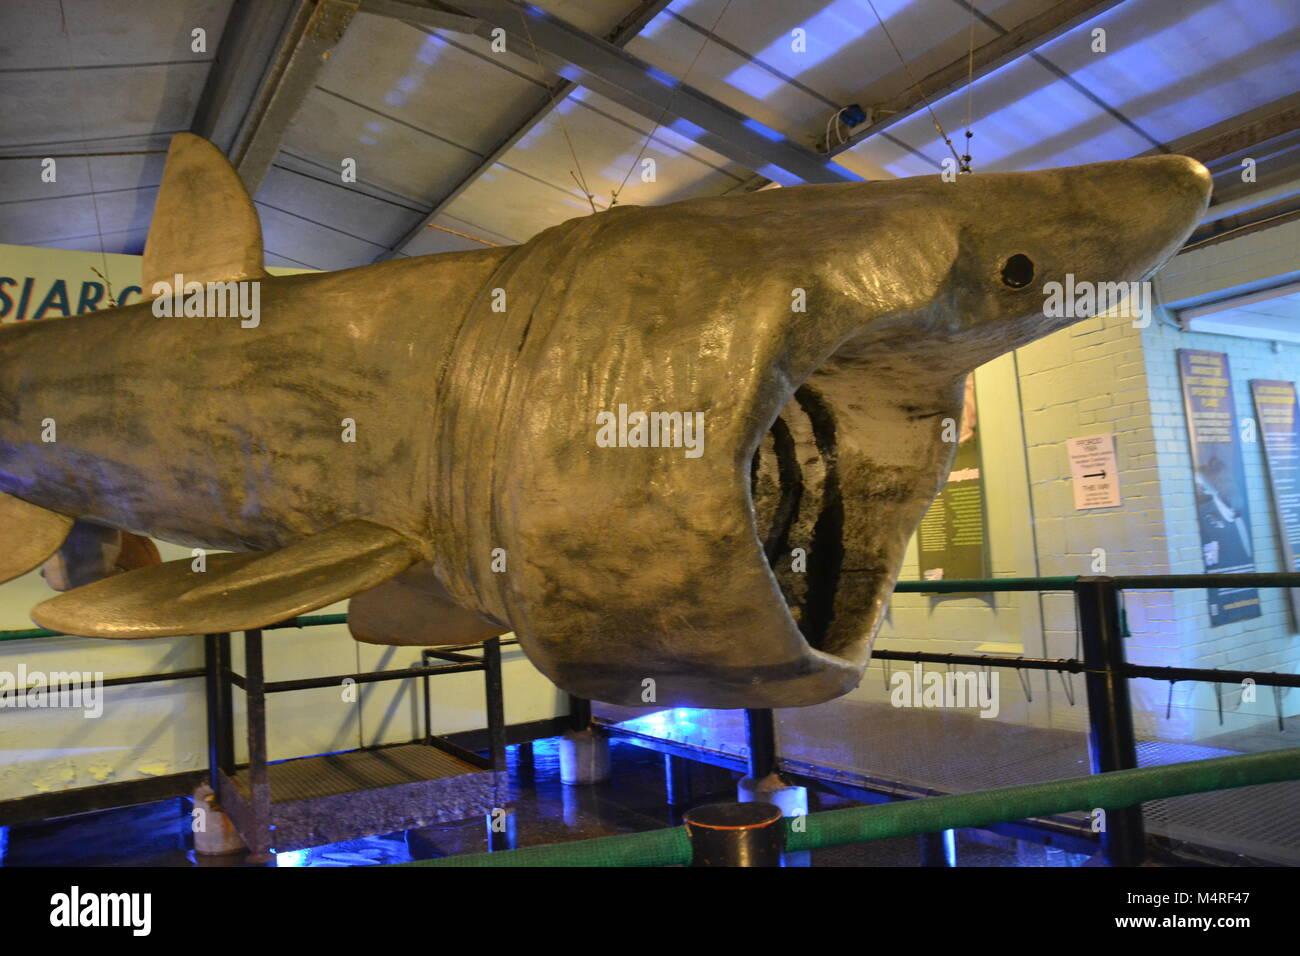 Manx basking shark model at Anglesey Sea Zoo, Aquarium - Stock Image